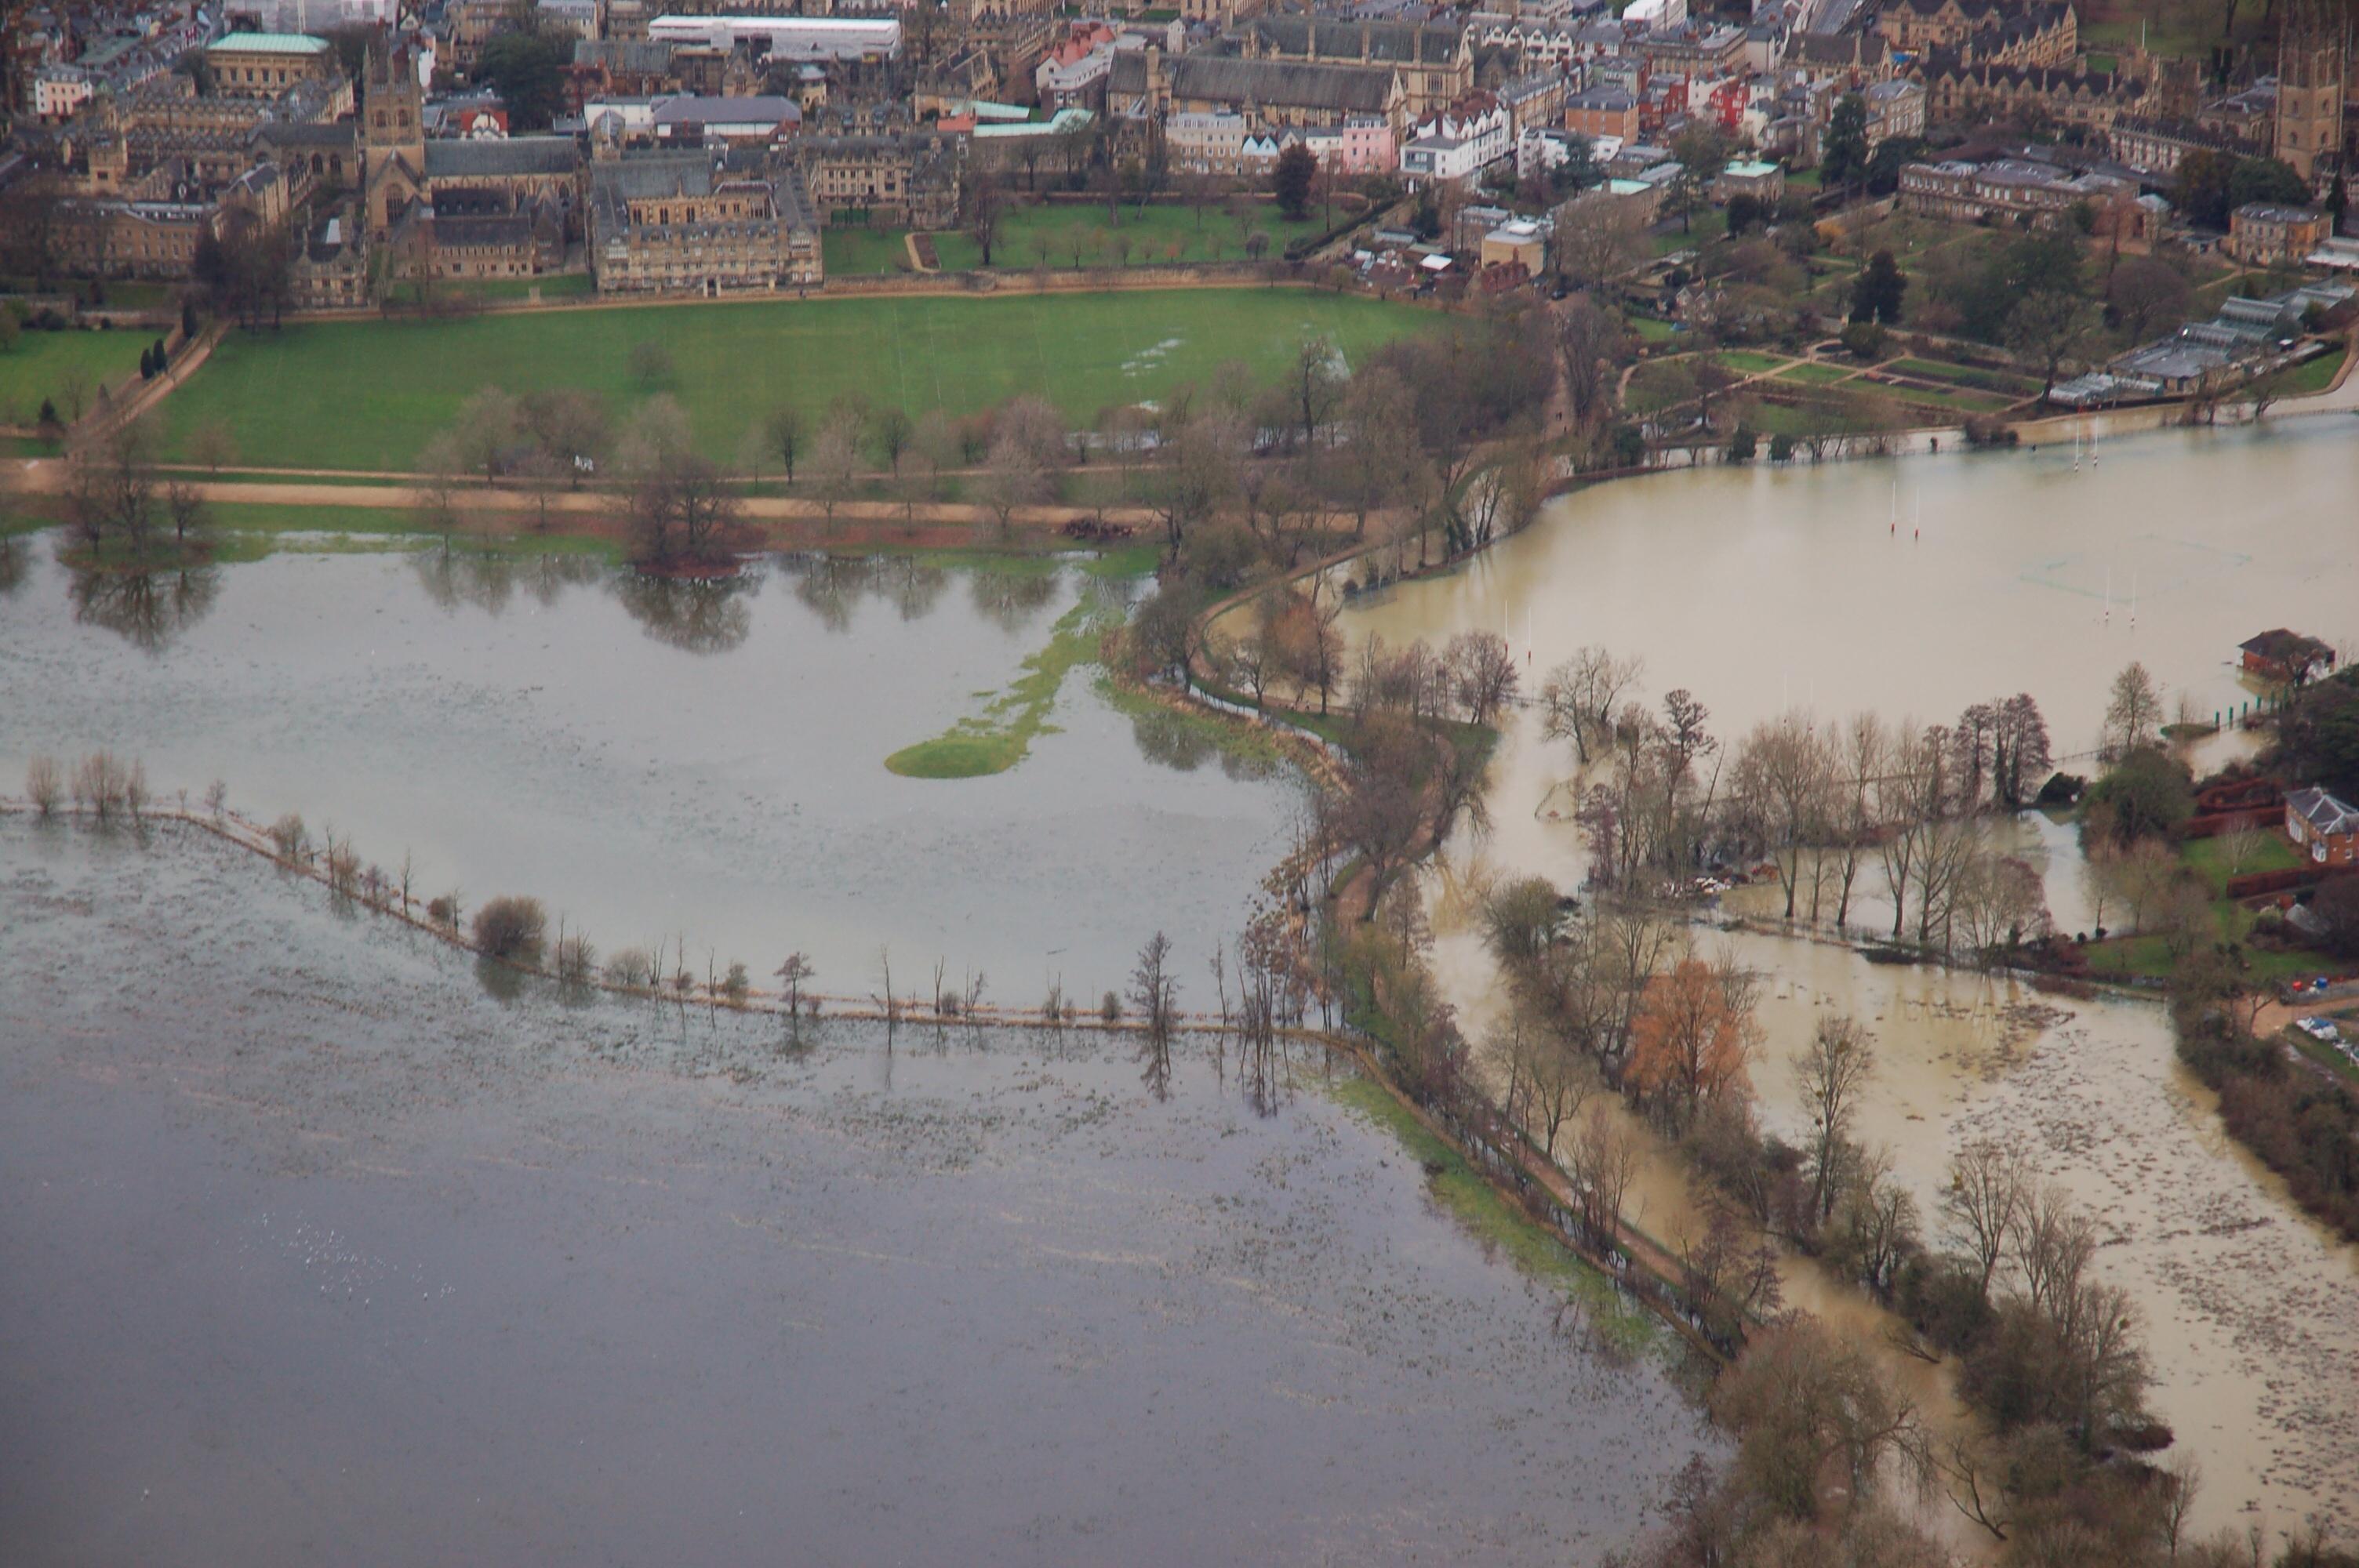 Christ Church Meadow, Oxford, in flood